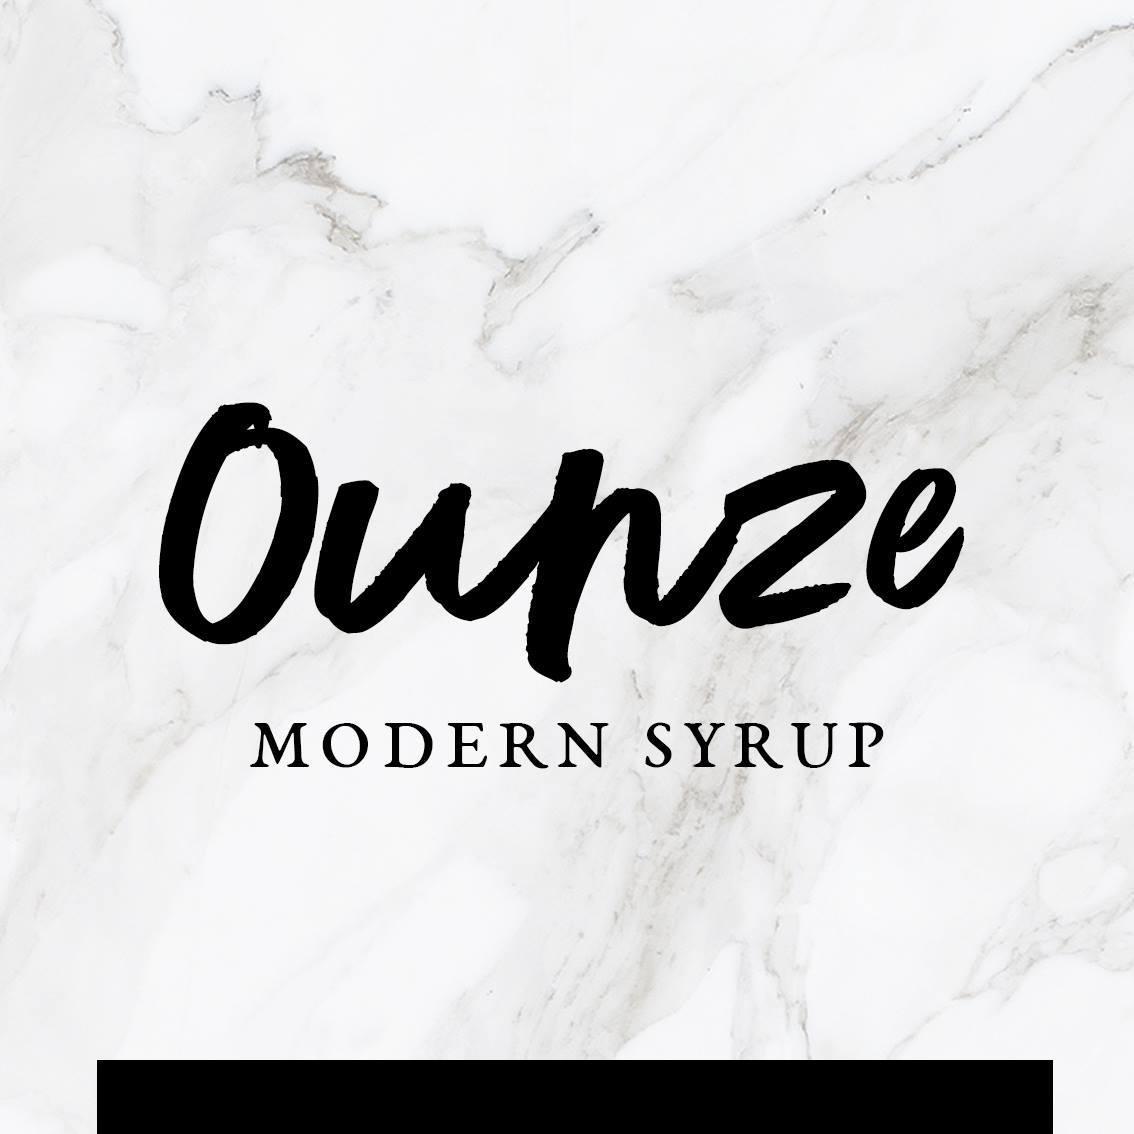 Ounze syrup